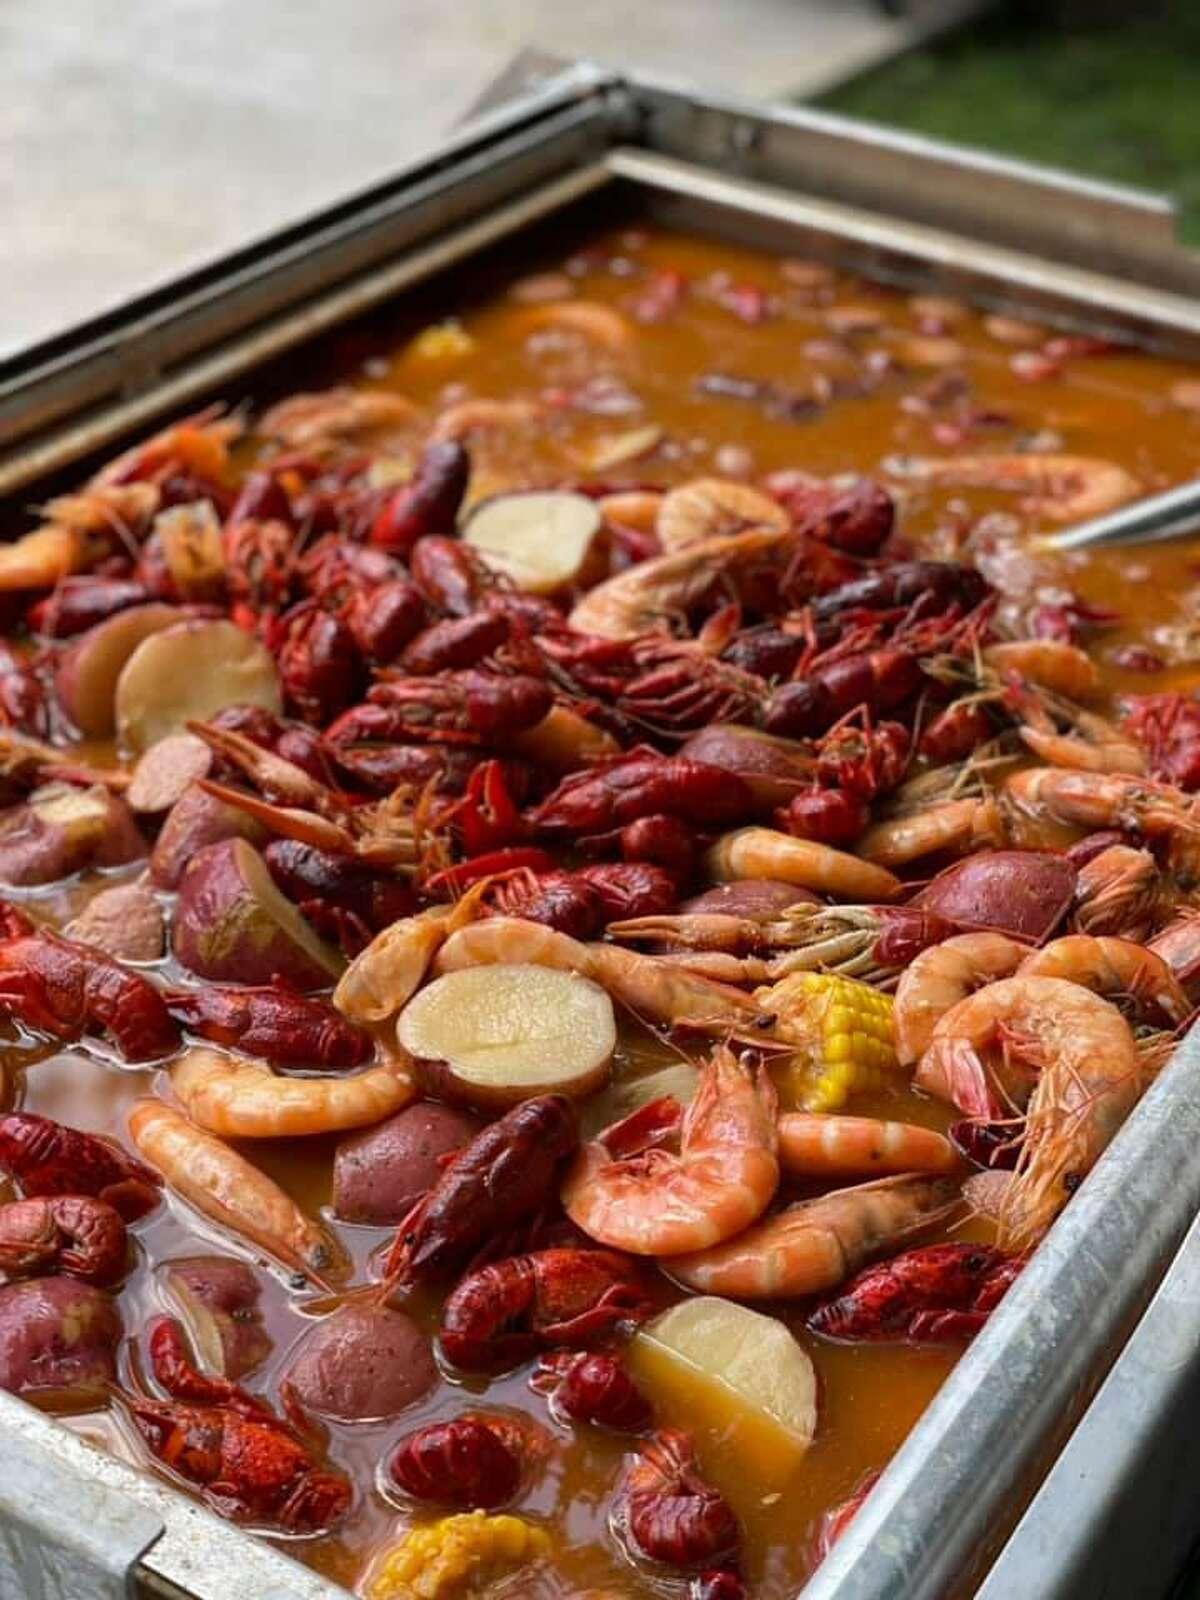 Crawfish boil from Cravorites